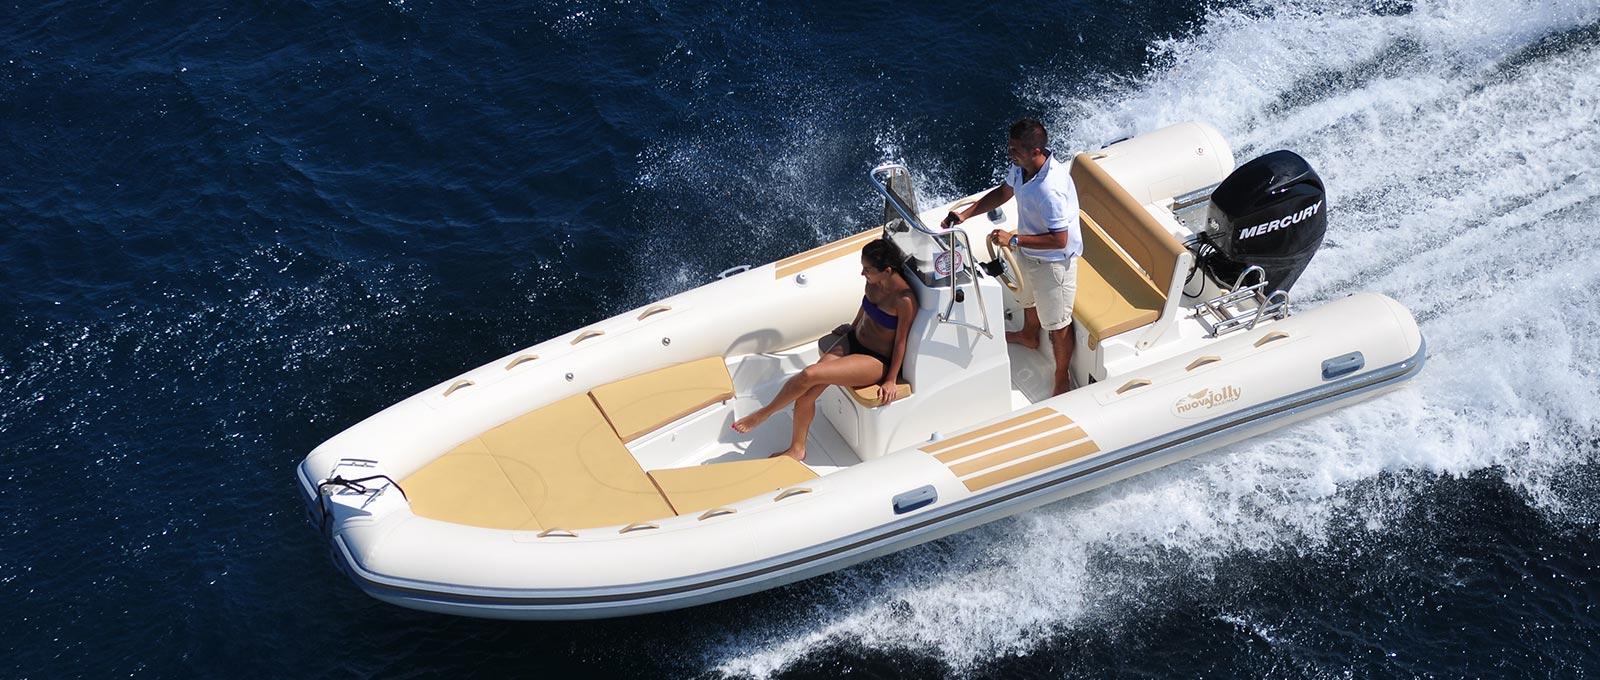 Nuova Jolly Nj 585 Gt - The Boutique Boat Company